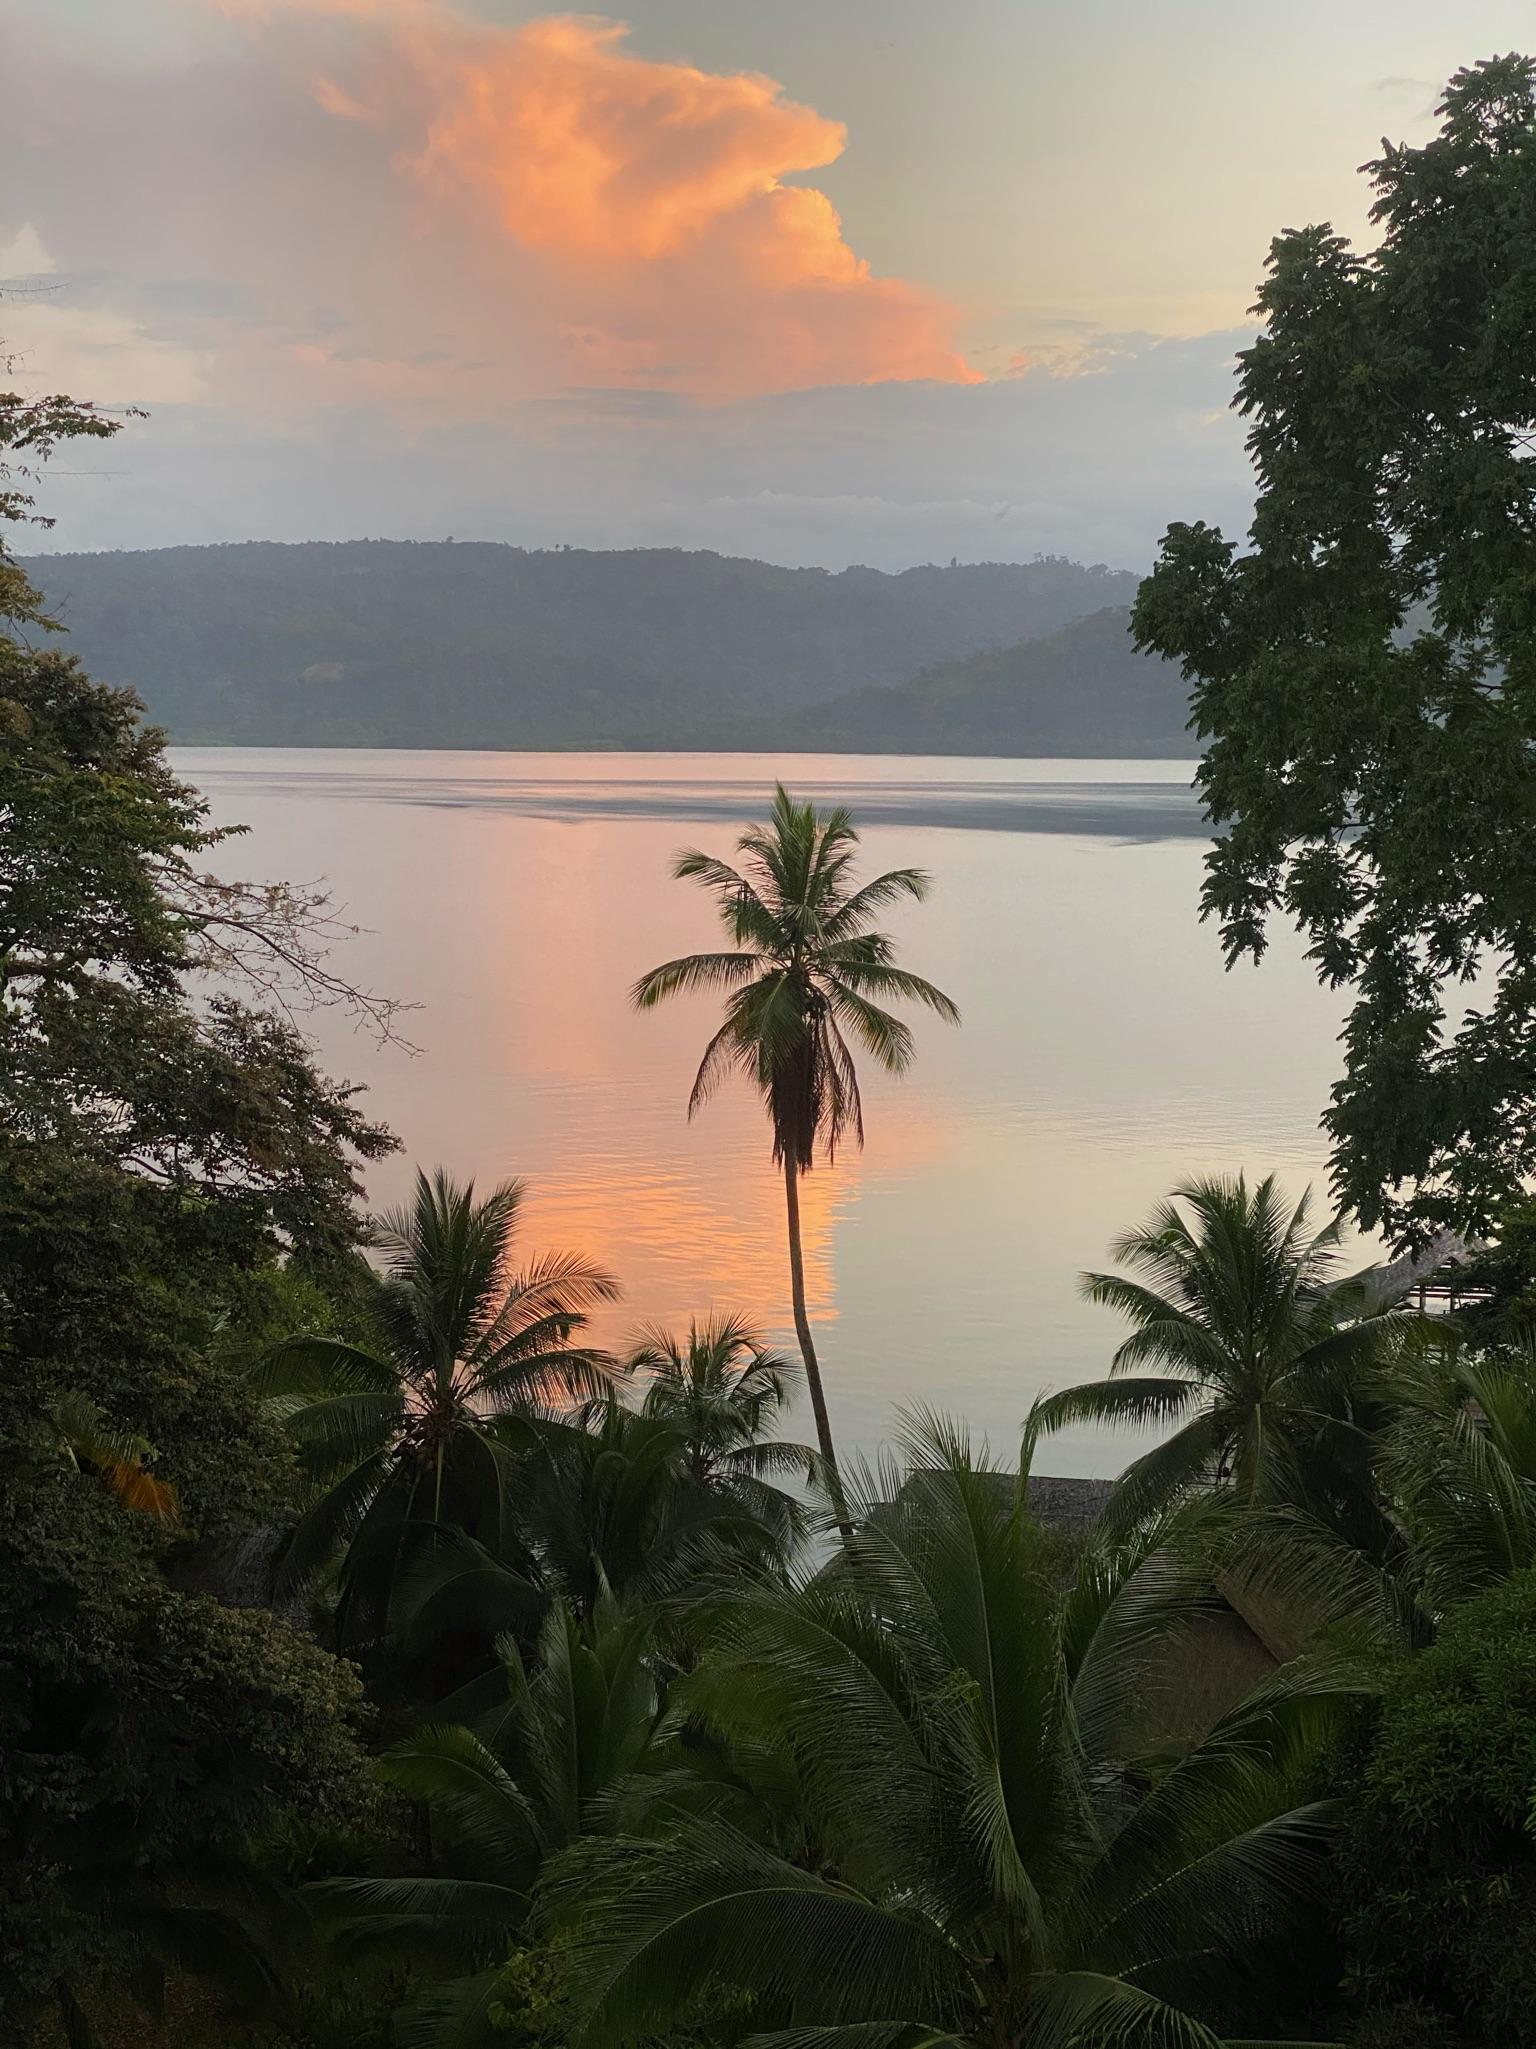 paysage isla pastores